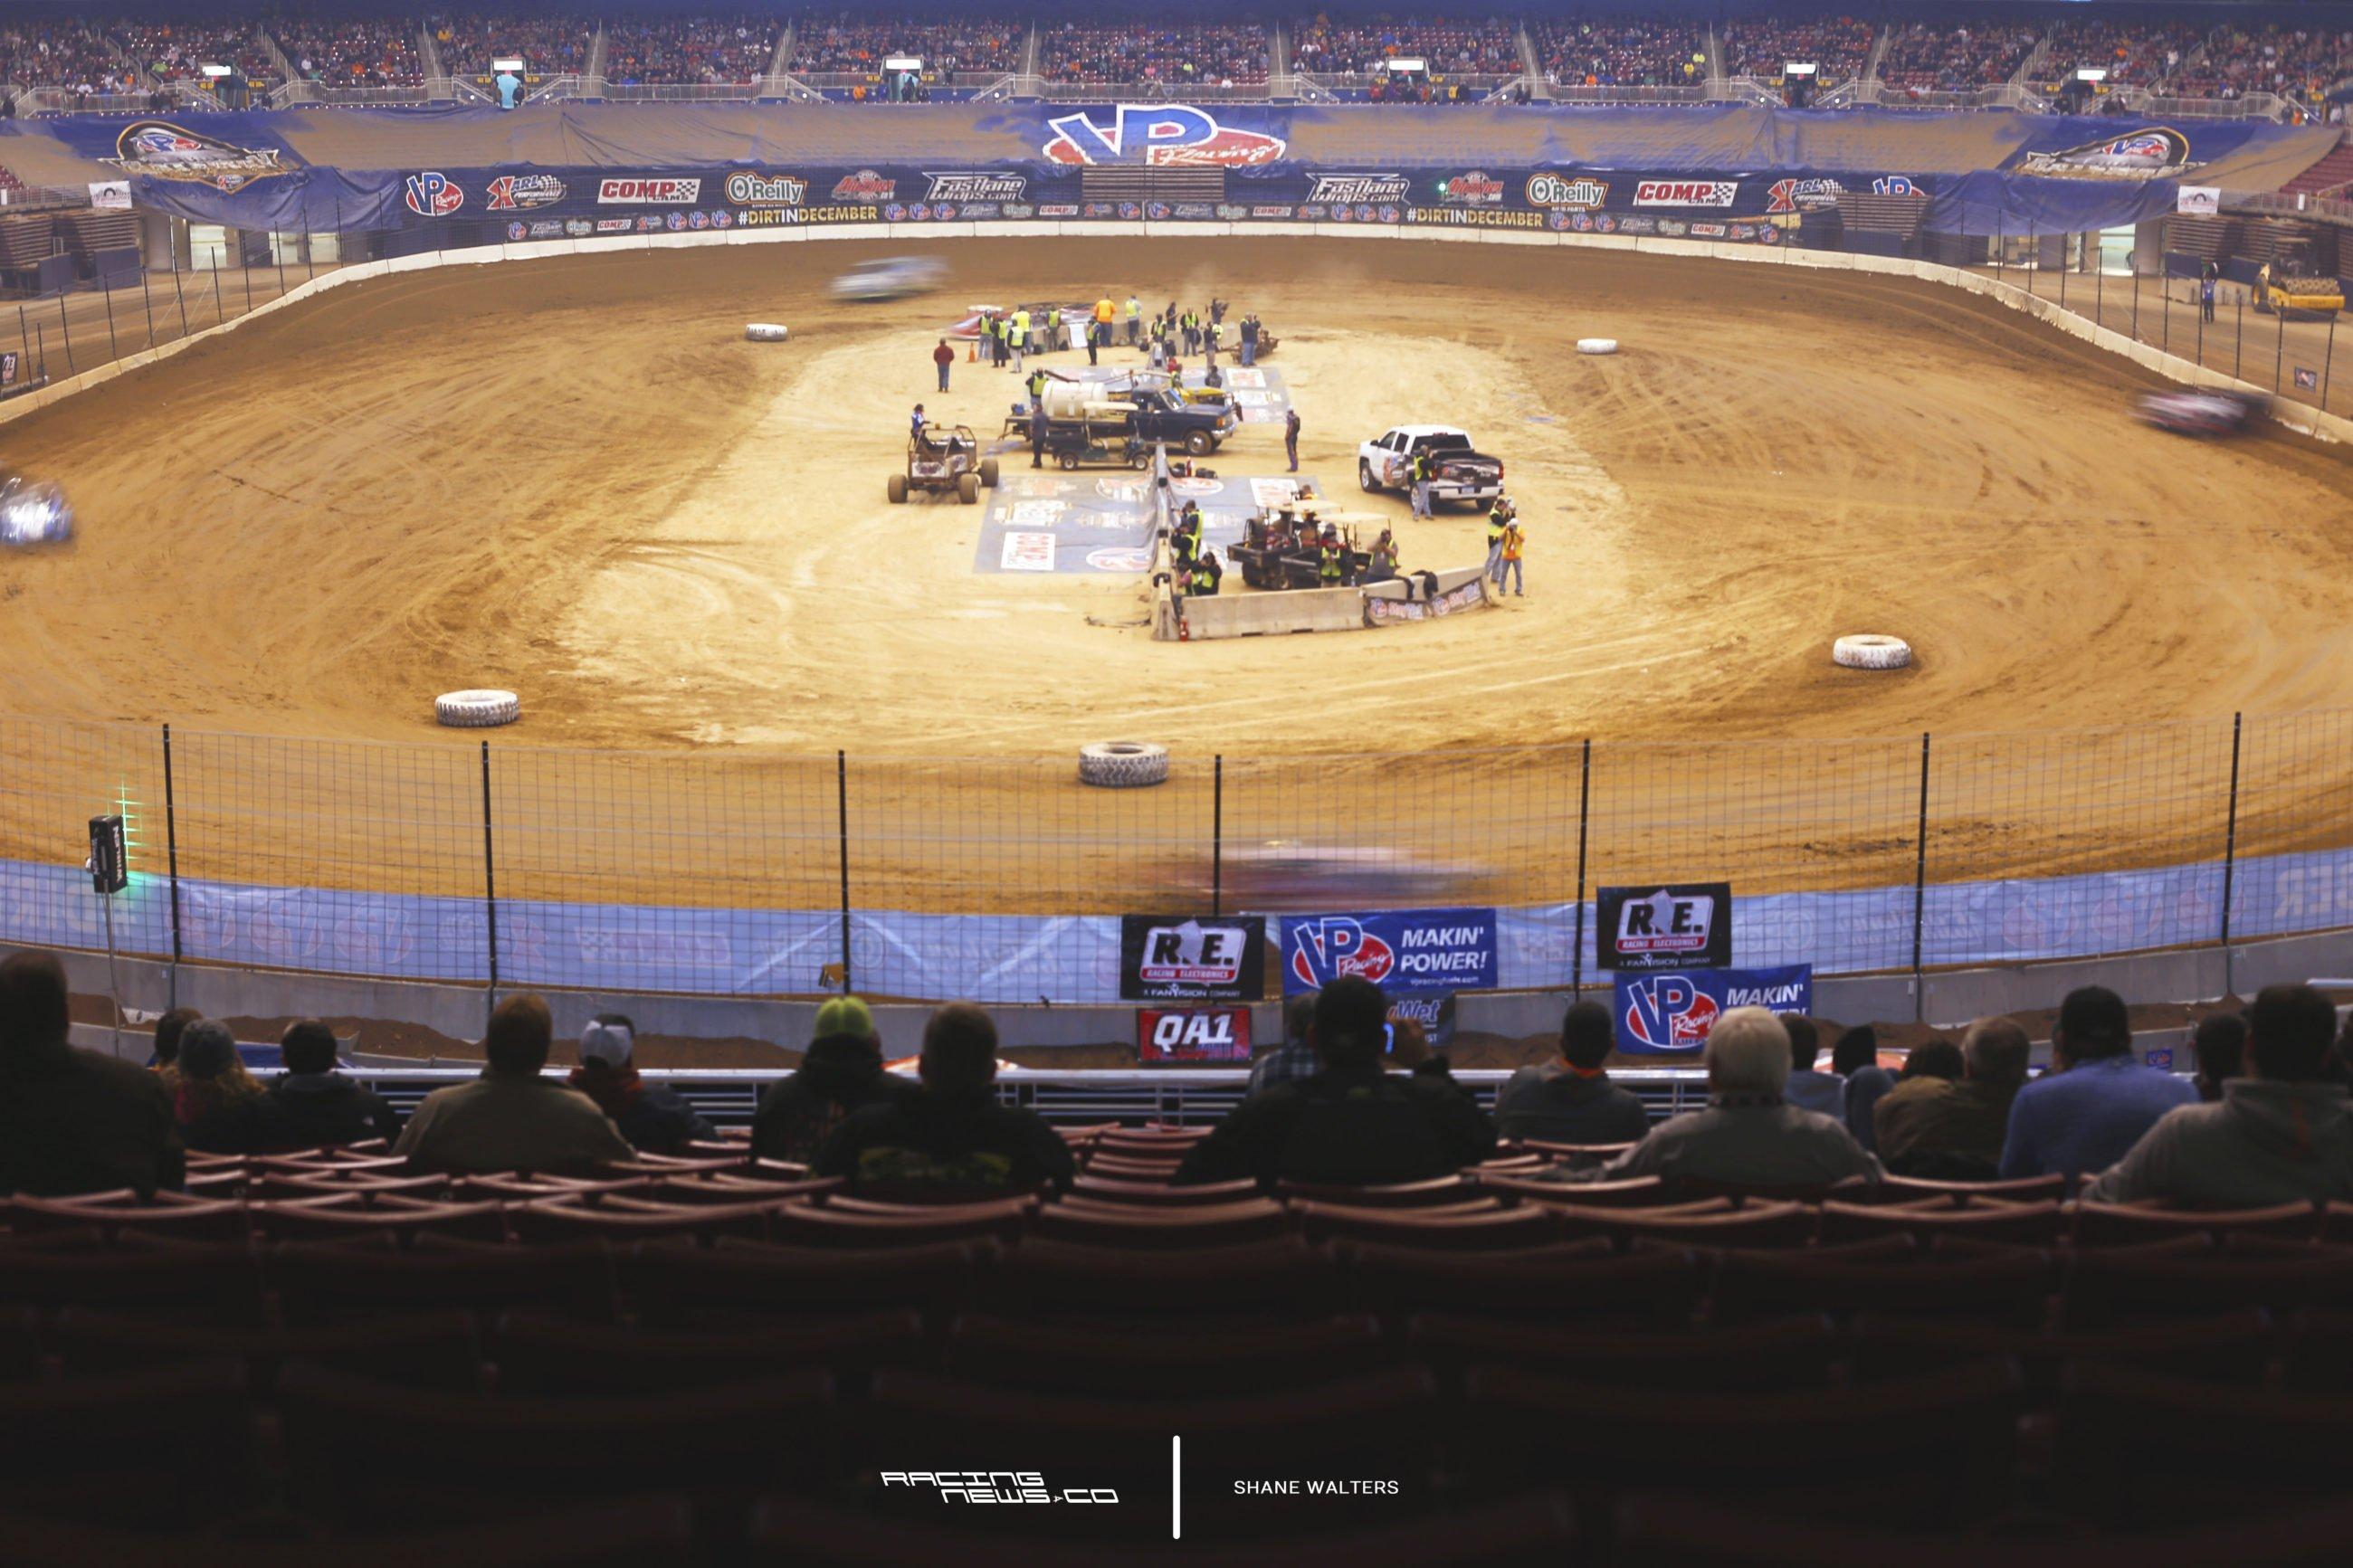 2016 Gateway Dirt Nationals Photos - Motion Blur Edward Jones Dome 8403